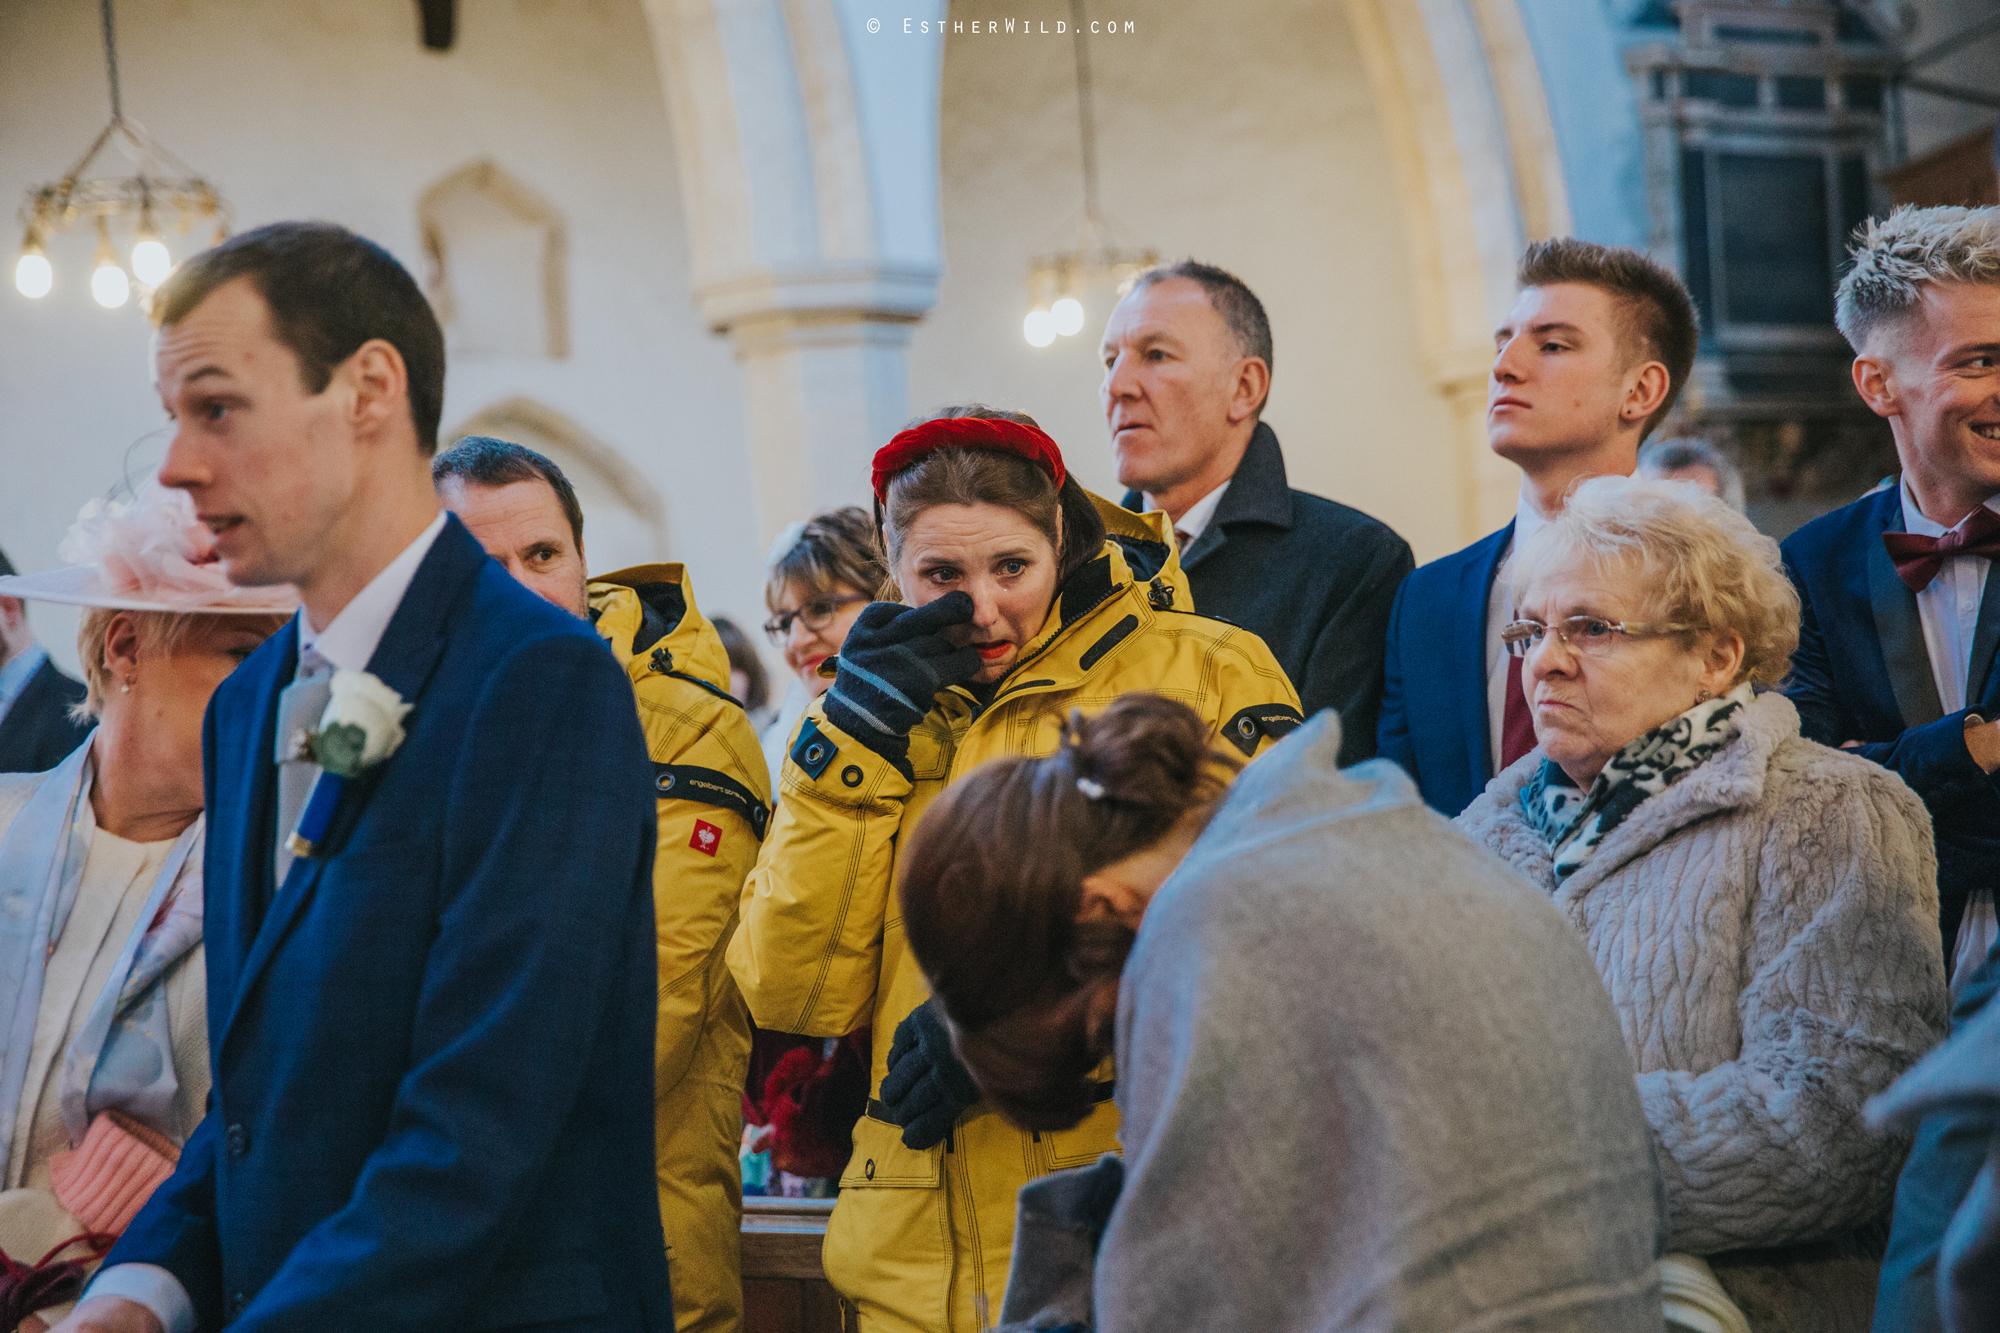 Wedding_Photography_Diss_Gawdy_Hall_Redenhall_Church_Norfolk_Winter_Esther_Wild_Copyright_IMG_1259.jpg